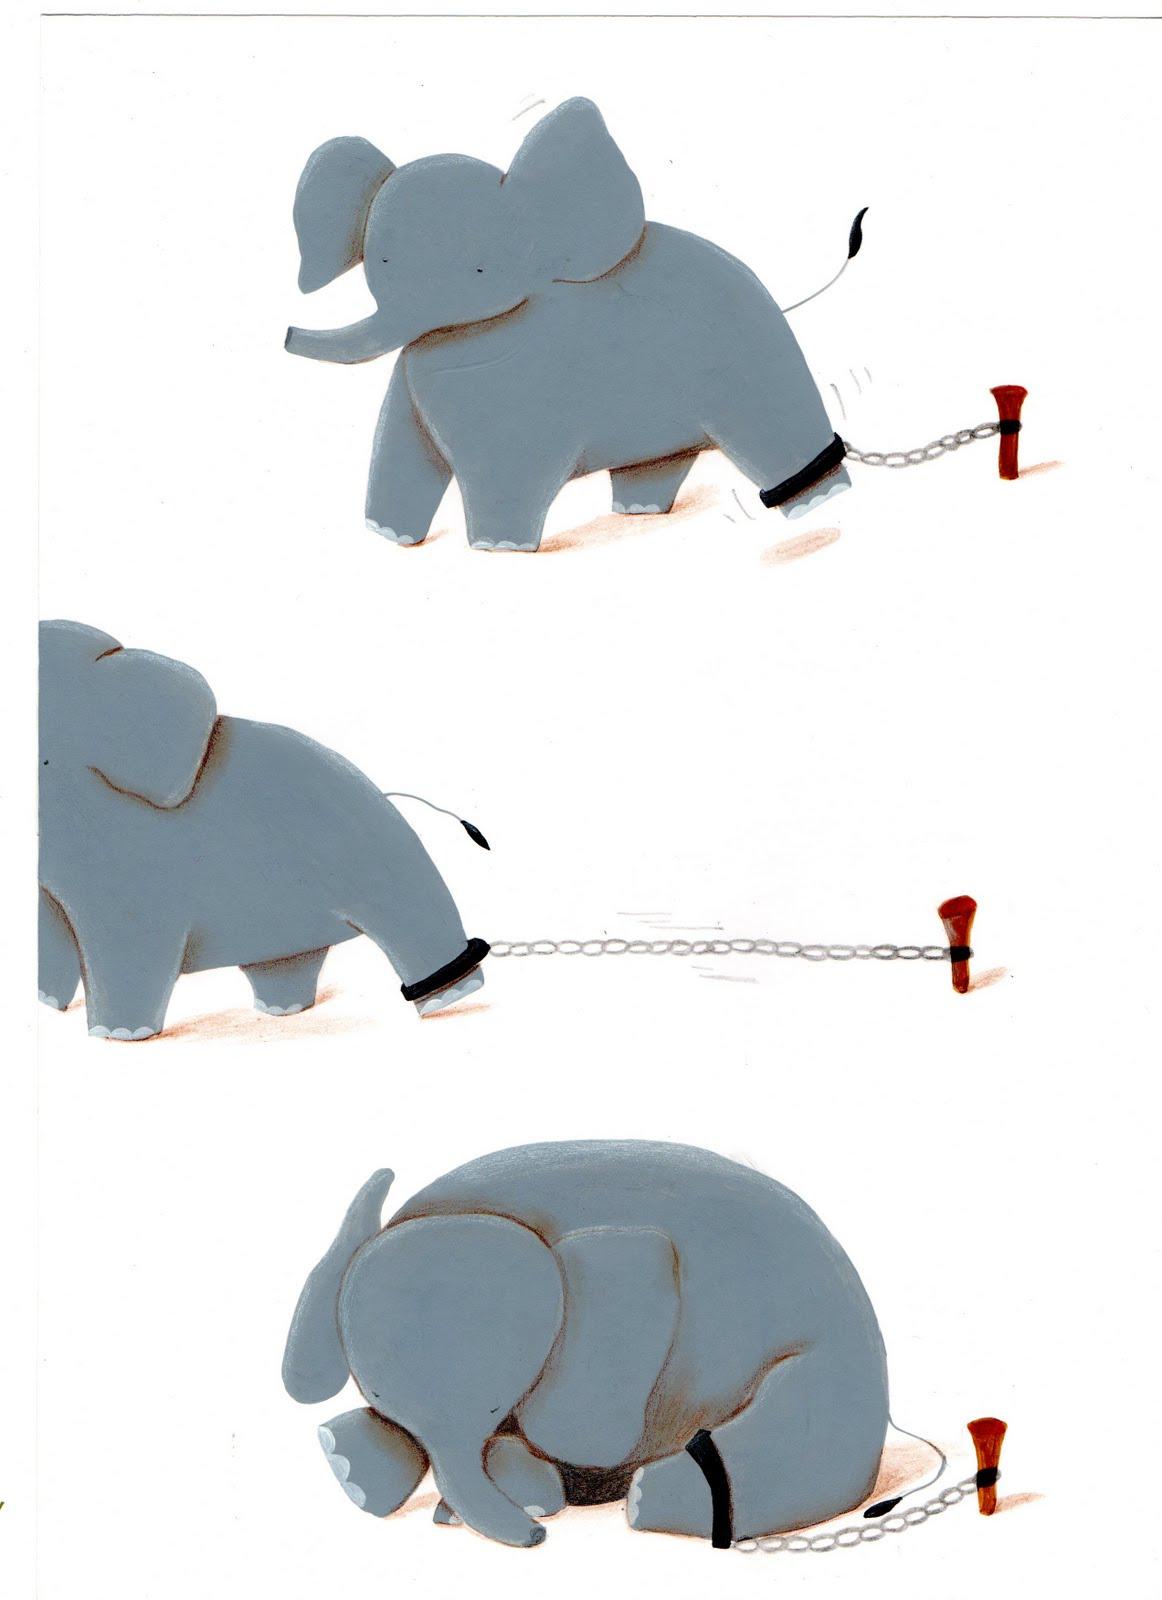 Lucrecia rodriguez el elefante encadenado for El elefante encadenado